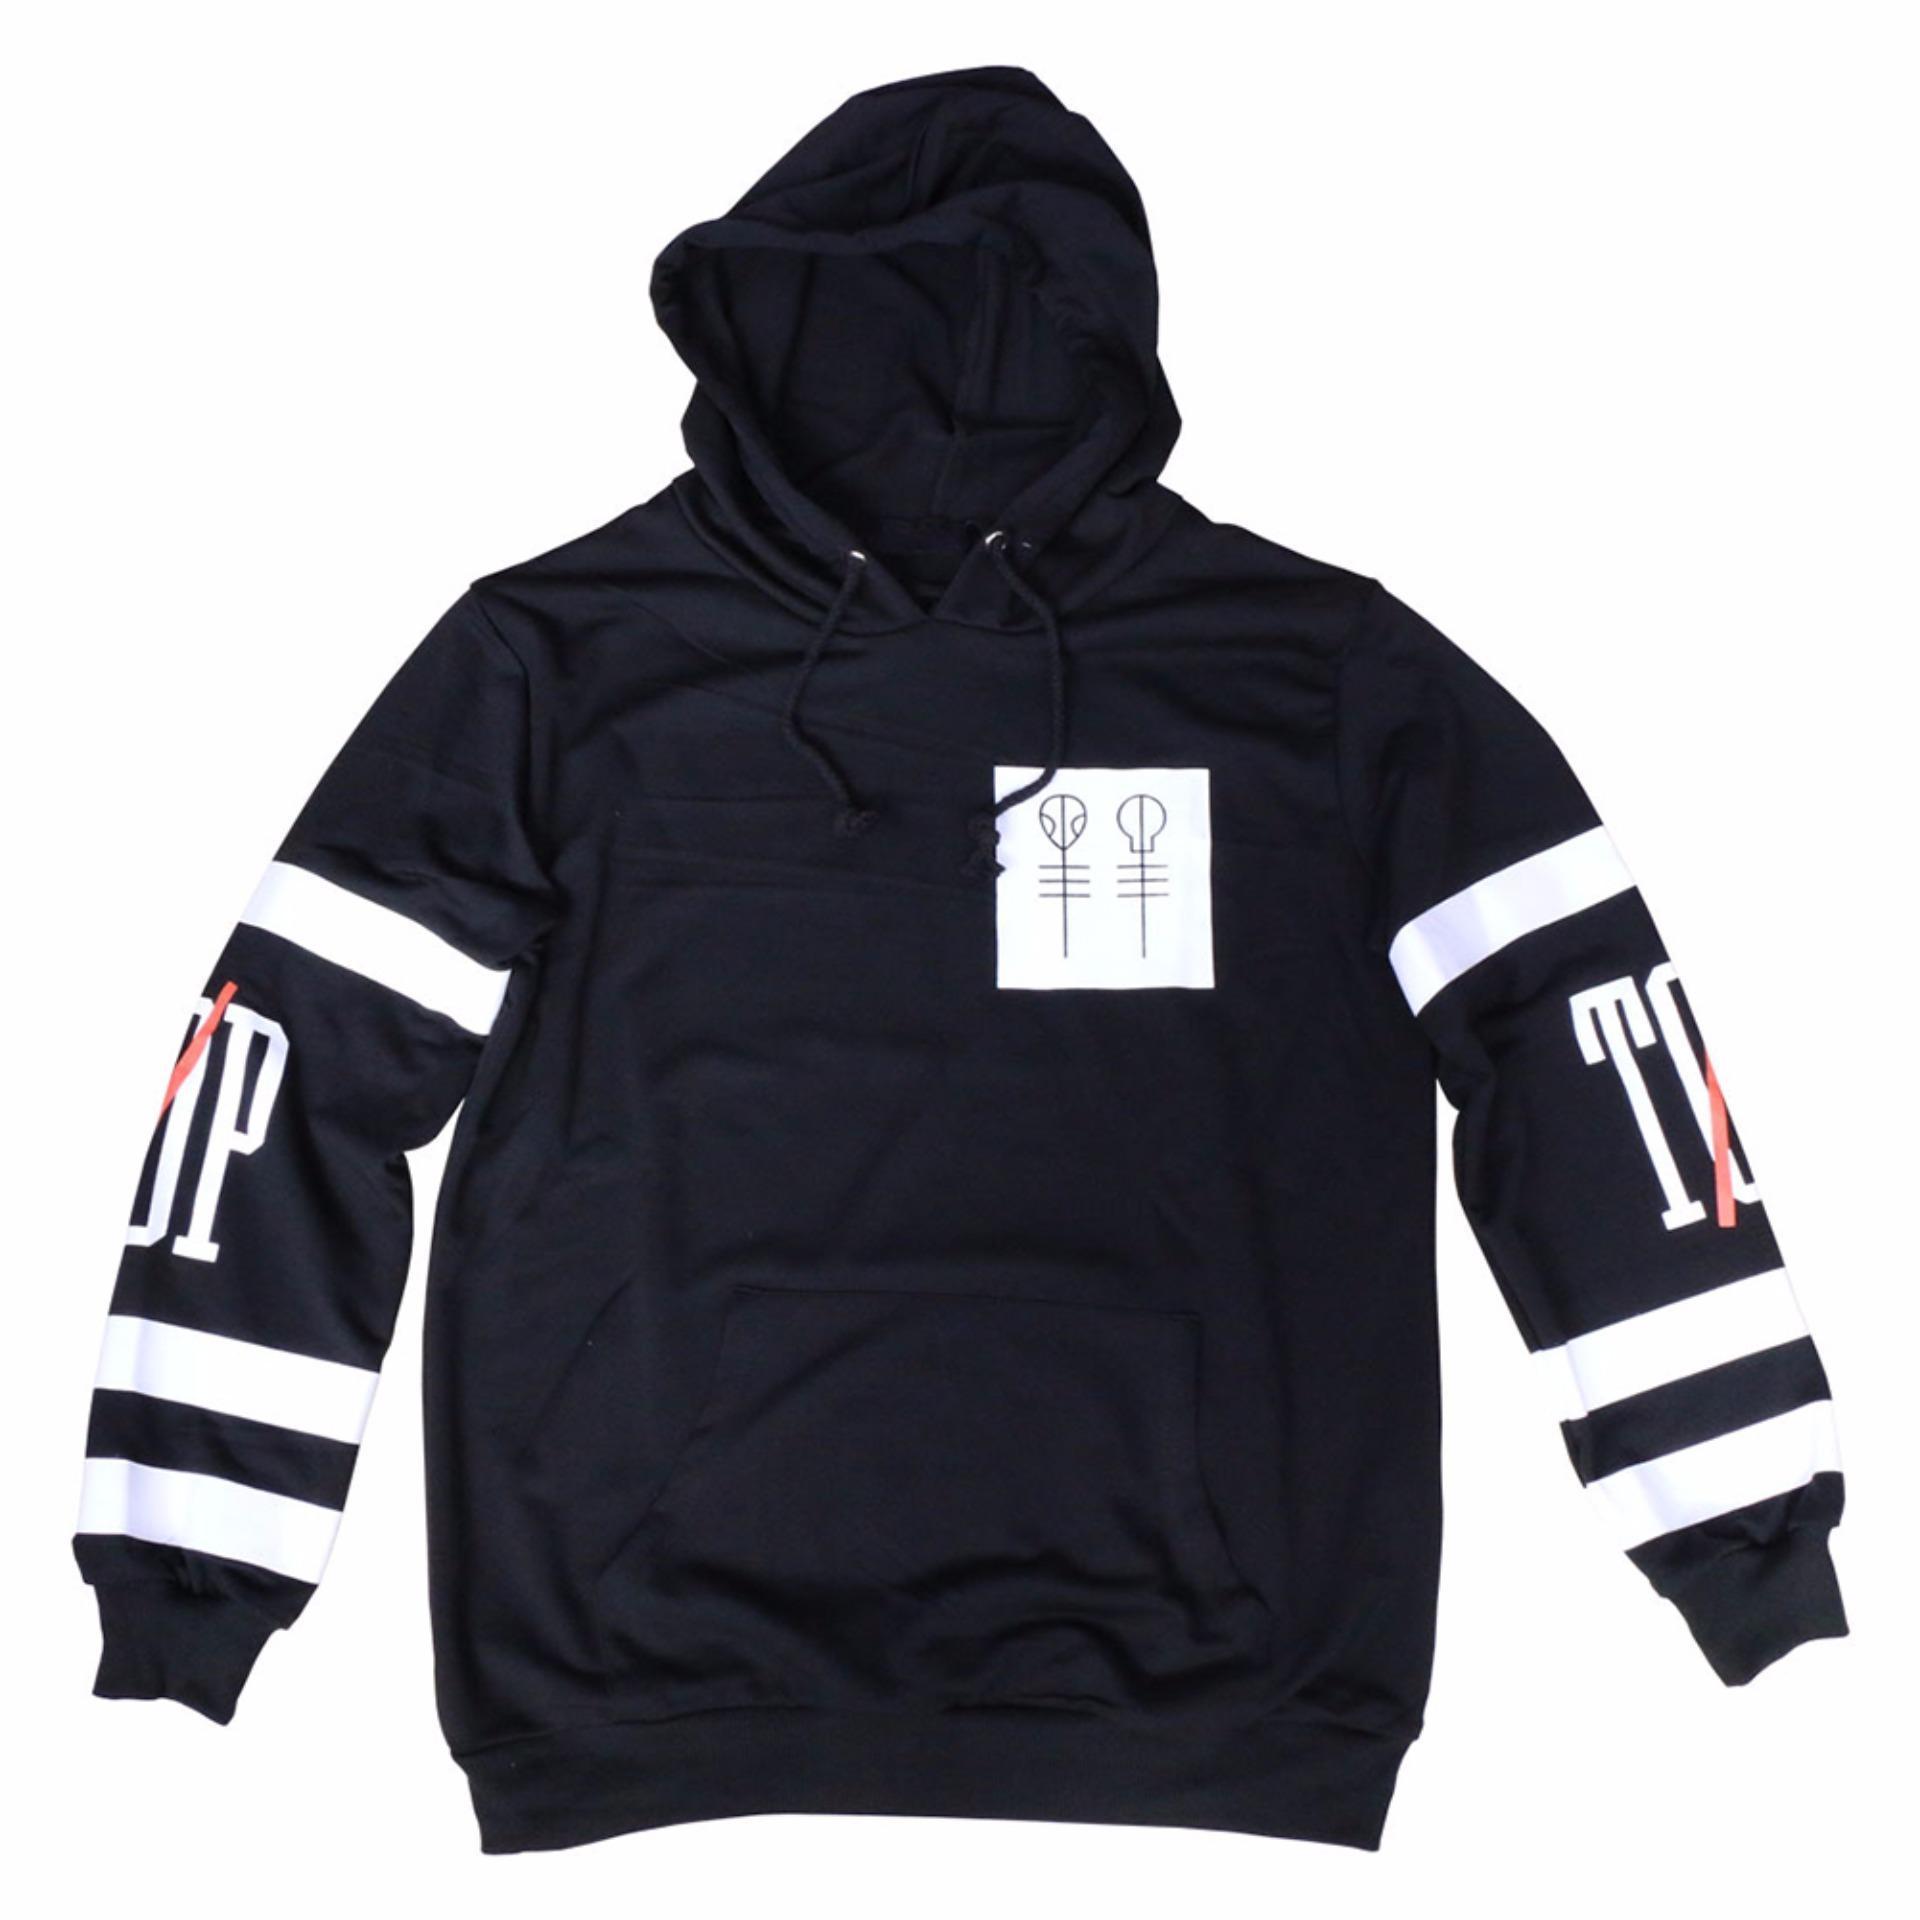 Hequ Fashion New Twenty One Pilots Big Logo Hooded Male Streetwear Kaos Band Original Gildan Cliqueart Streetwearhip Hop Long